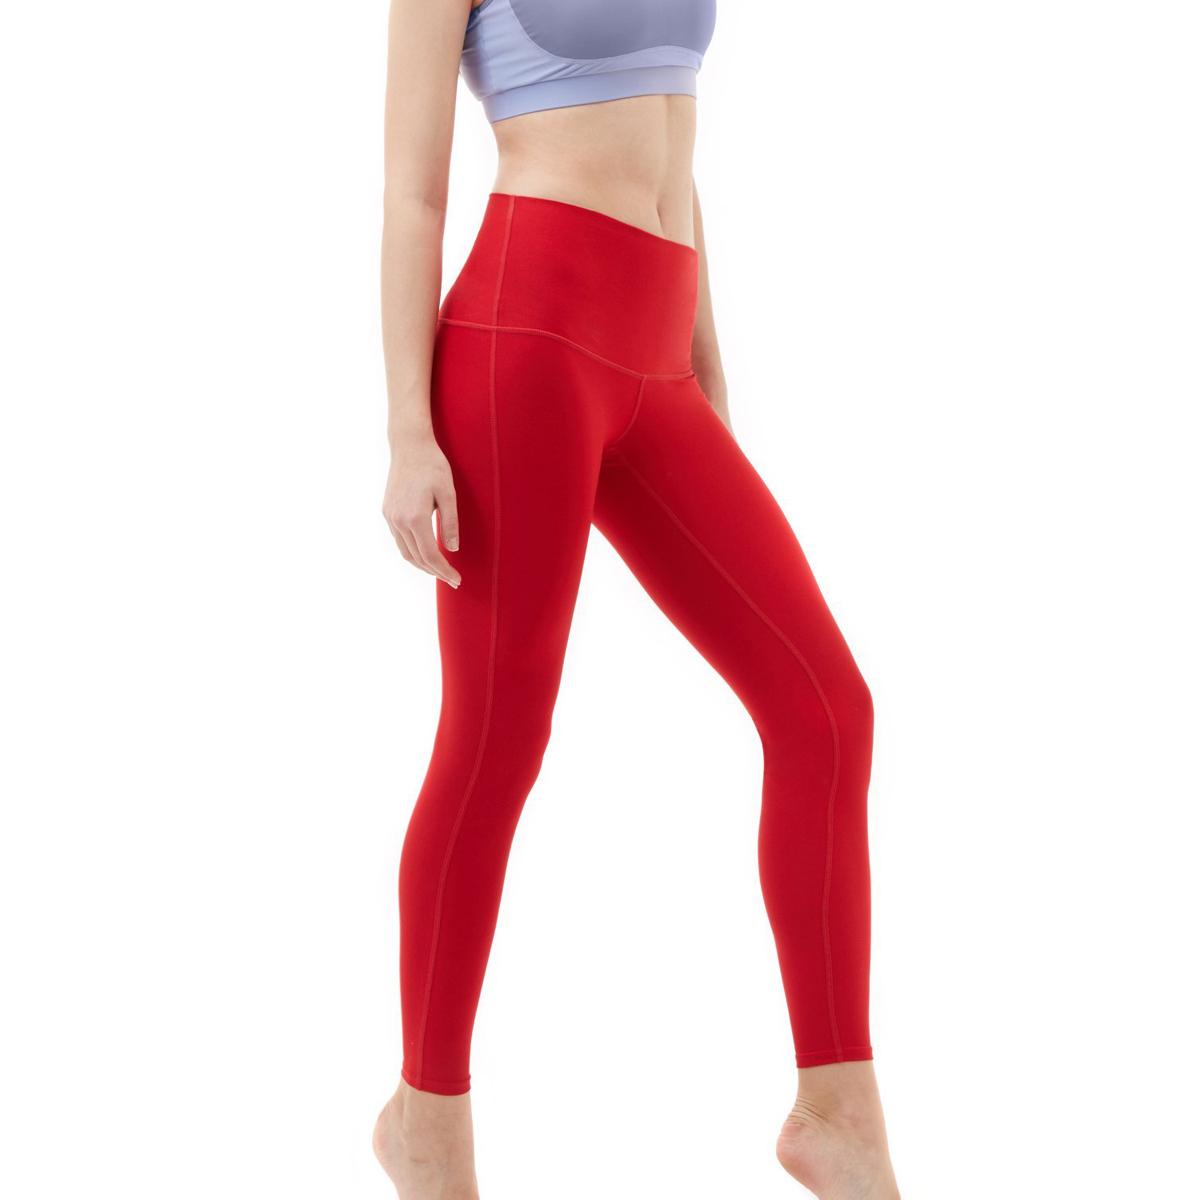 thumbnail 62 - TSLA Tesla FYP42 Women's High-Waisted Ultra-Stretch Tummy Control Yoga Pants